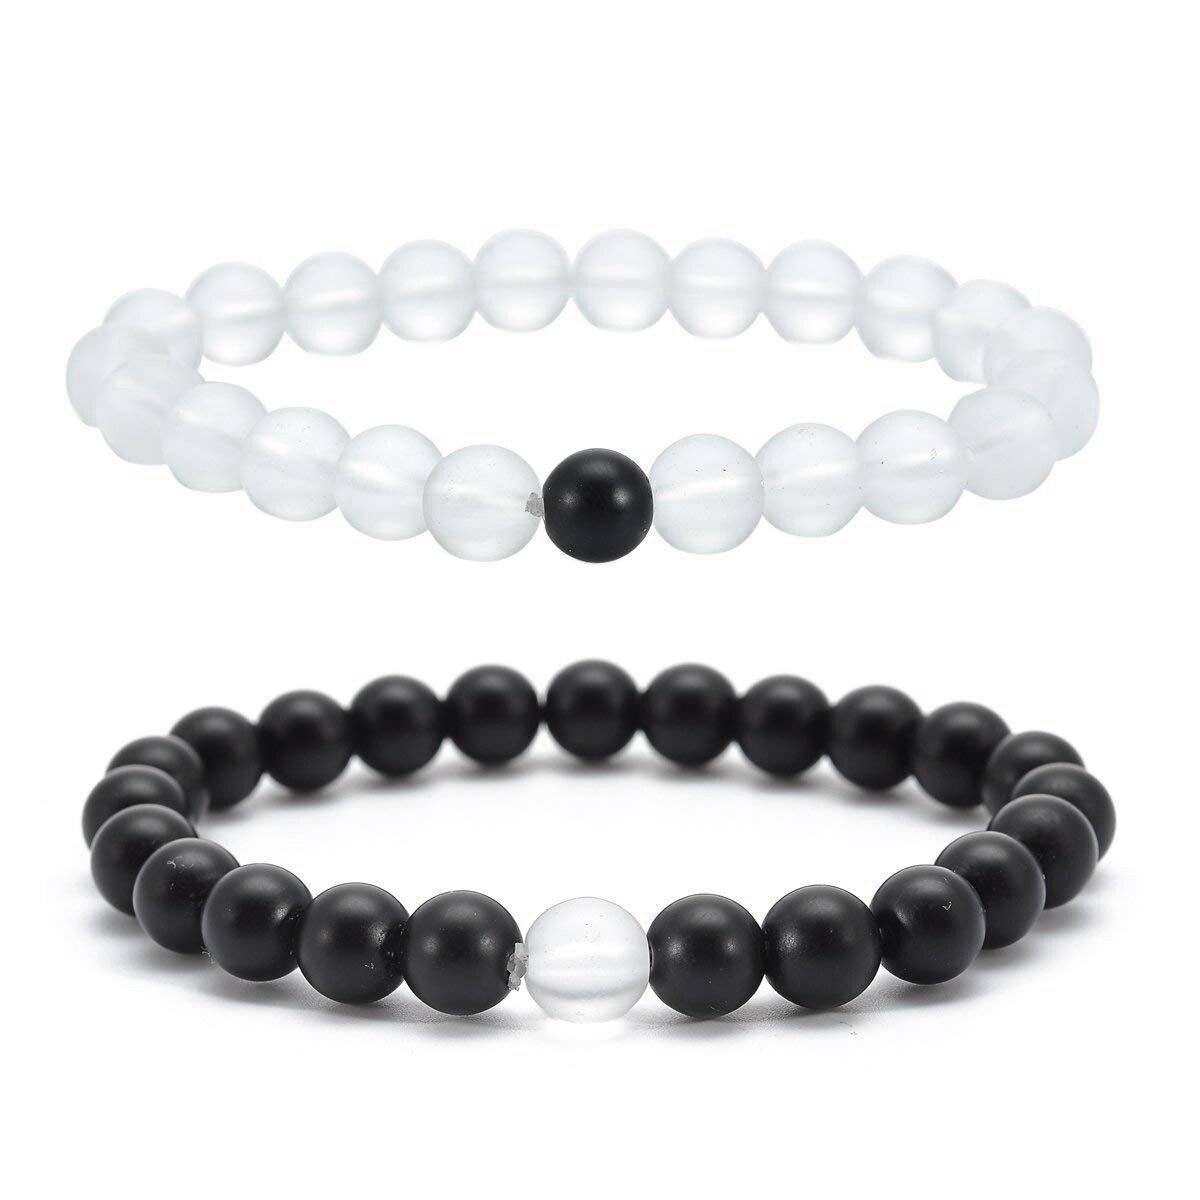 Distance Bracelets Strong Elastic Friends Relationship Couples His Hers Beads Bracelets